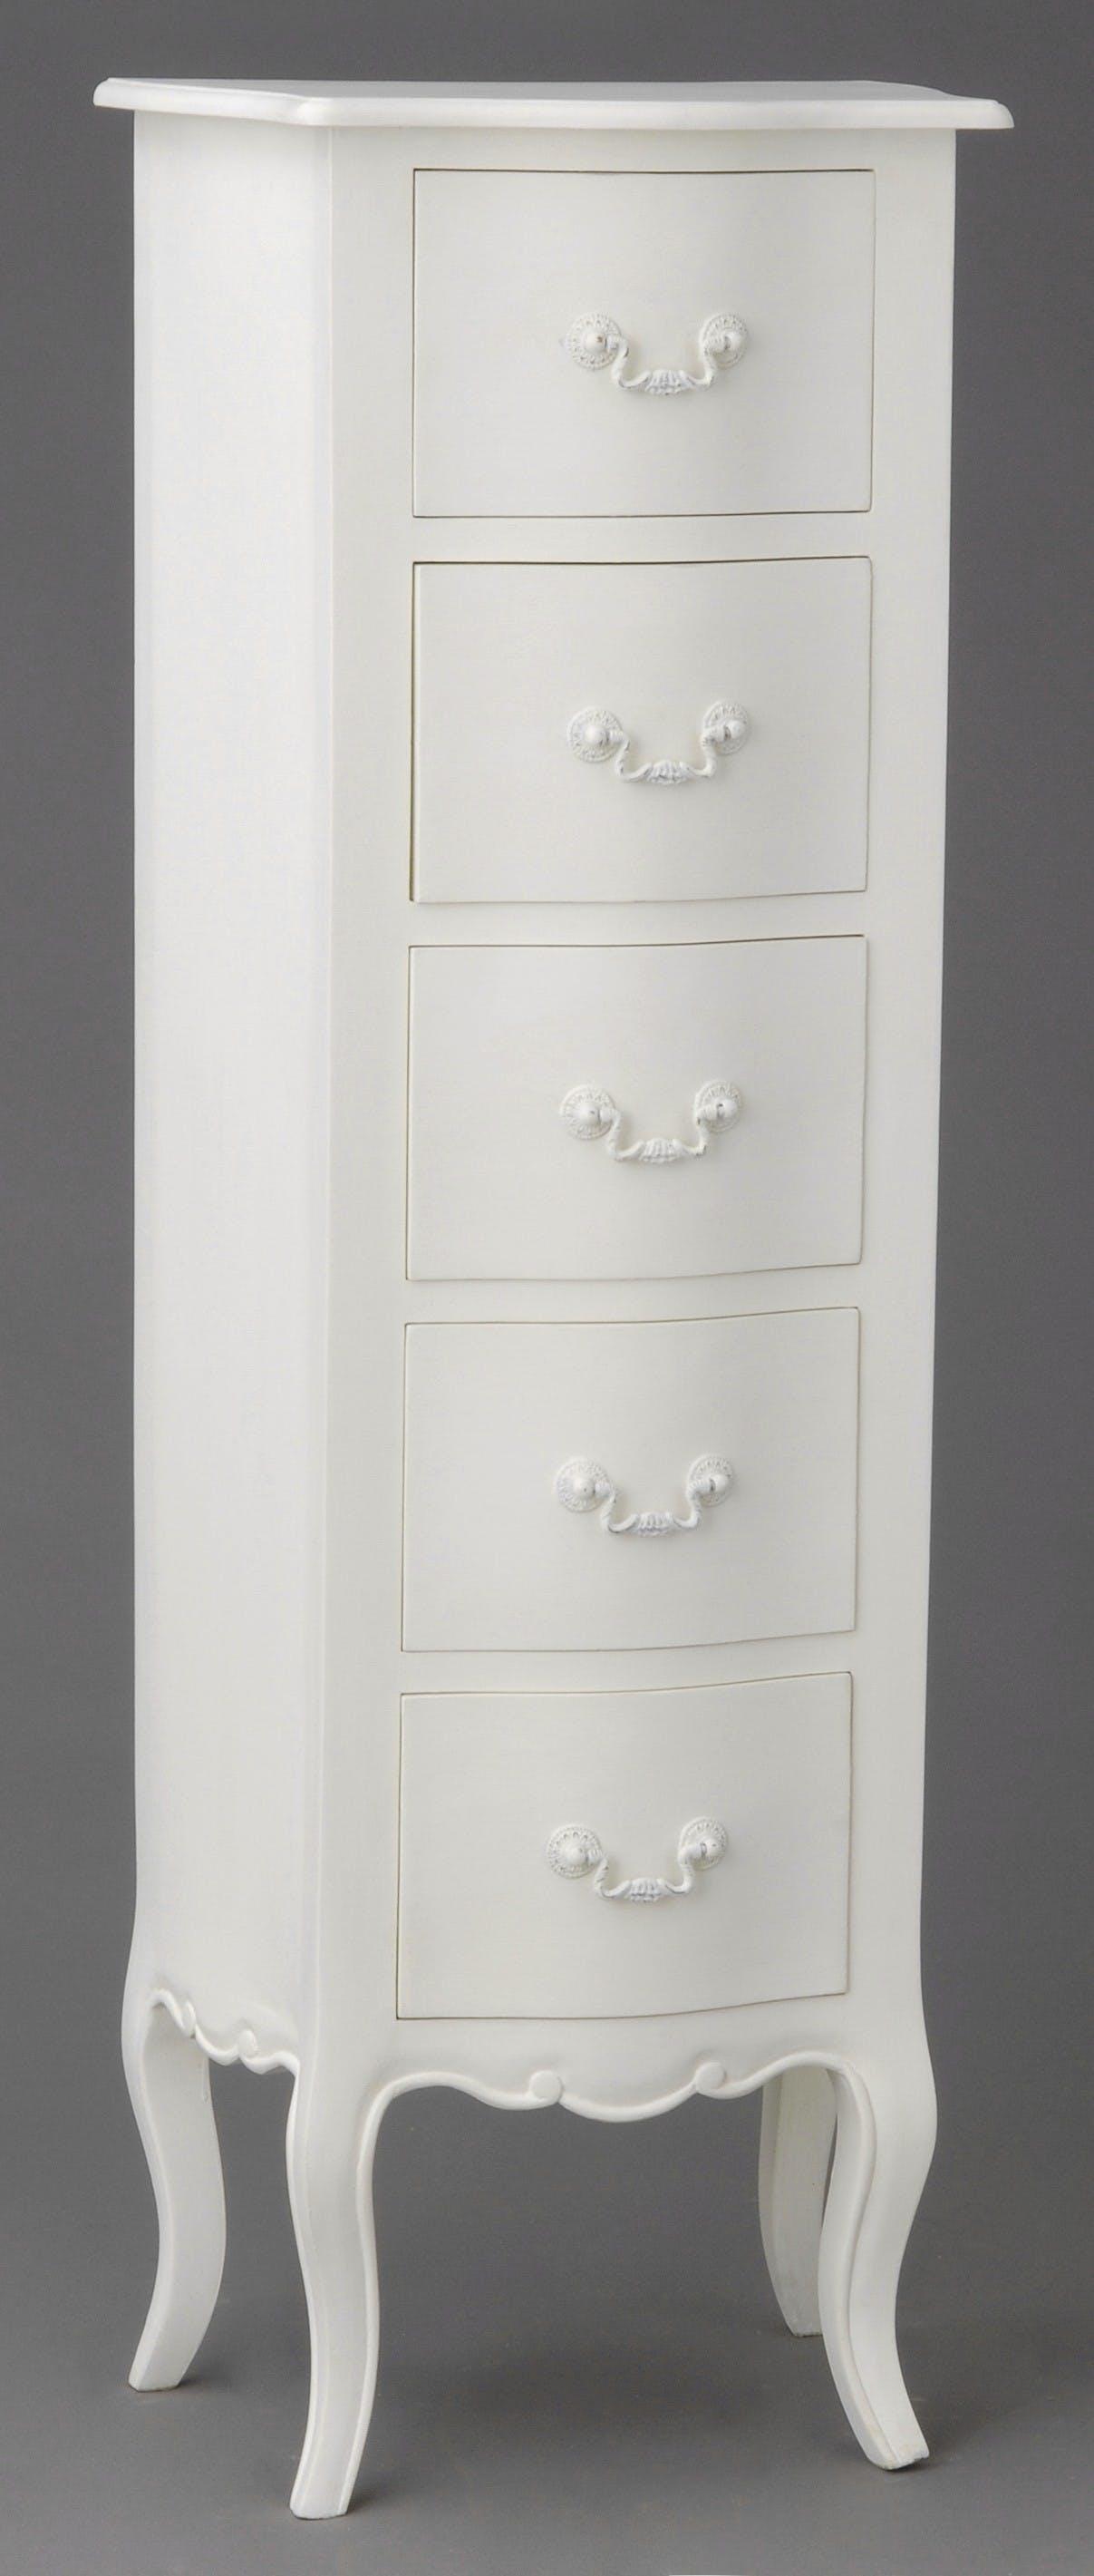 Chiffonnier 5 tiroirs romantique Acajou blanc APOLLINE L 40 x P 30 x H 115 AMADEUS